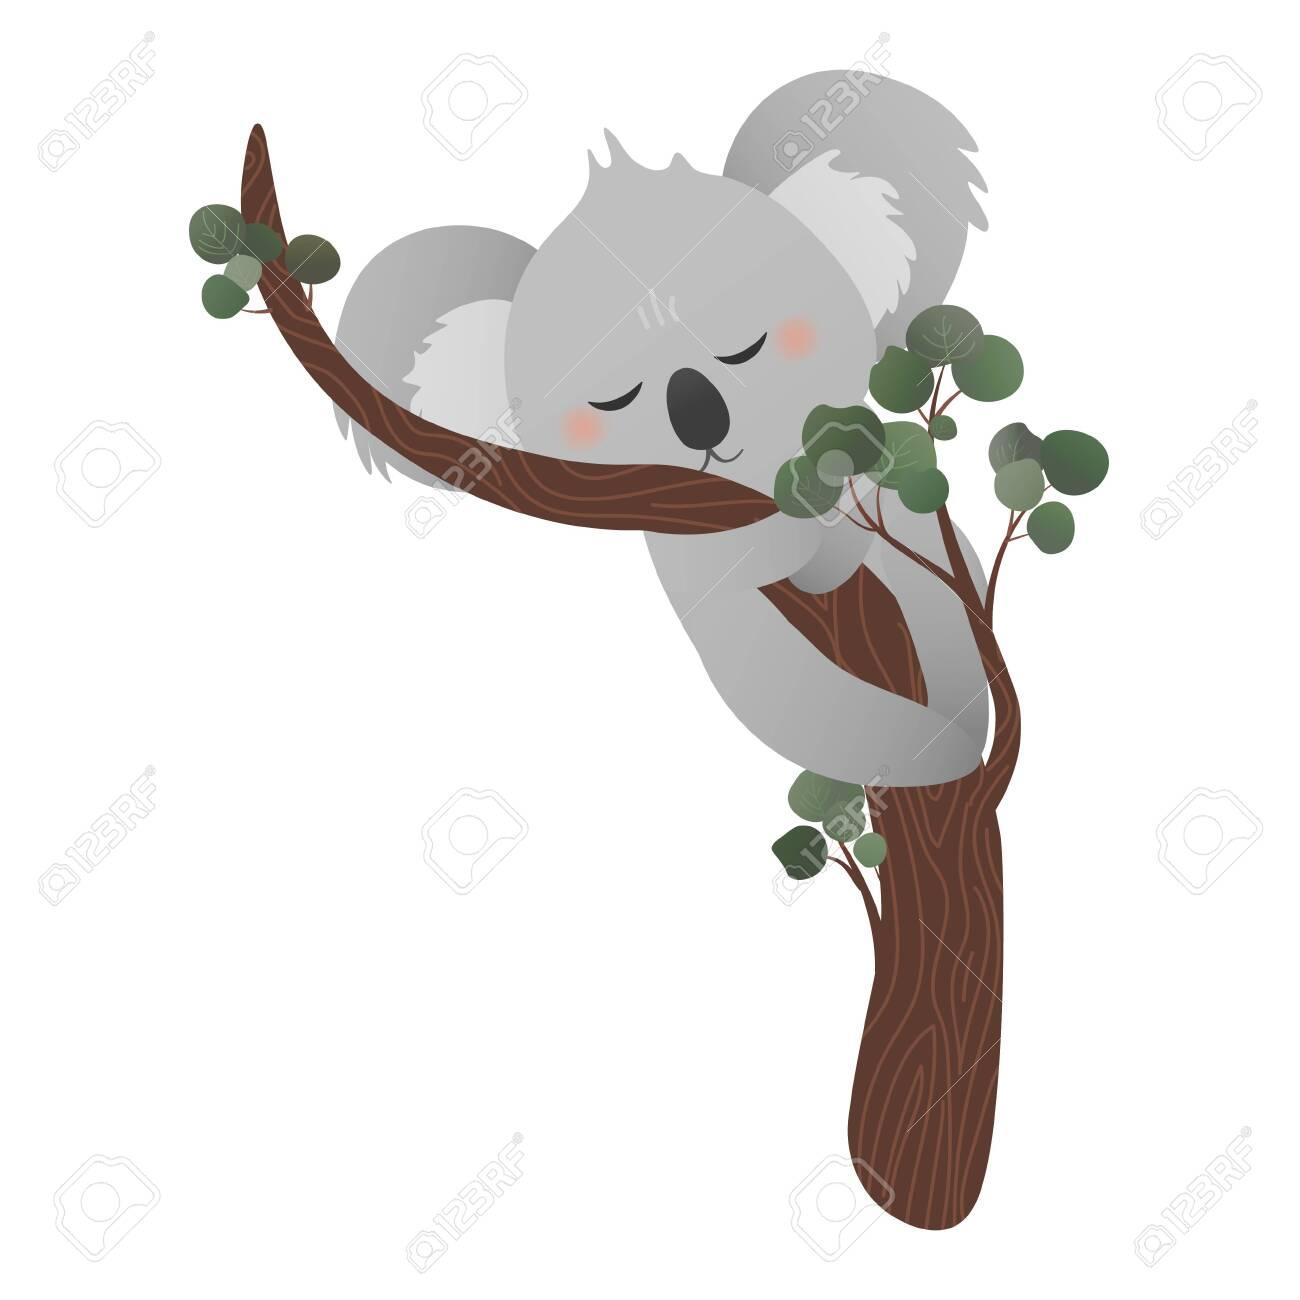 Cute Koala Bear Sleeping On Eucalyptus Tree While Hugging Tree Royalty Free Cliparts Vectors And Stock Illustration Image 157098006 5,654 eucalyptus cartoons on gograph. cute koala bear sleeping on eucalyptus tree while hugging tree